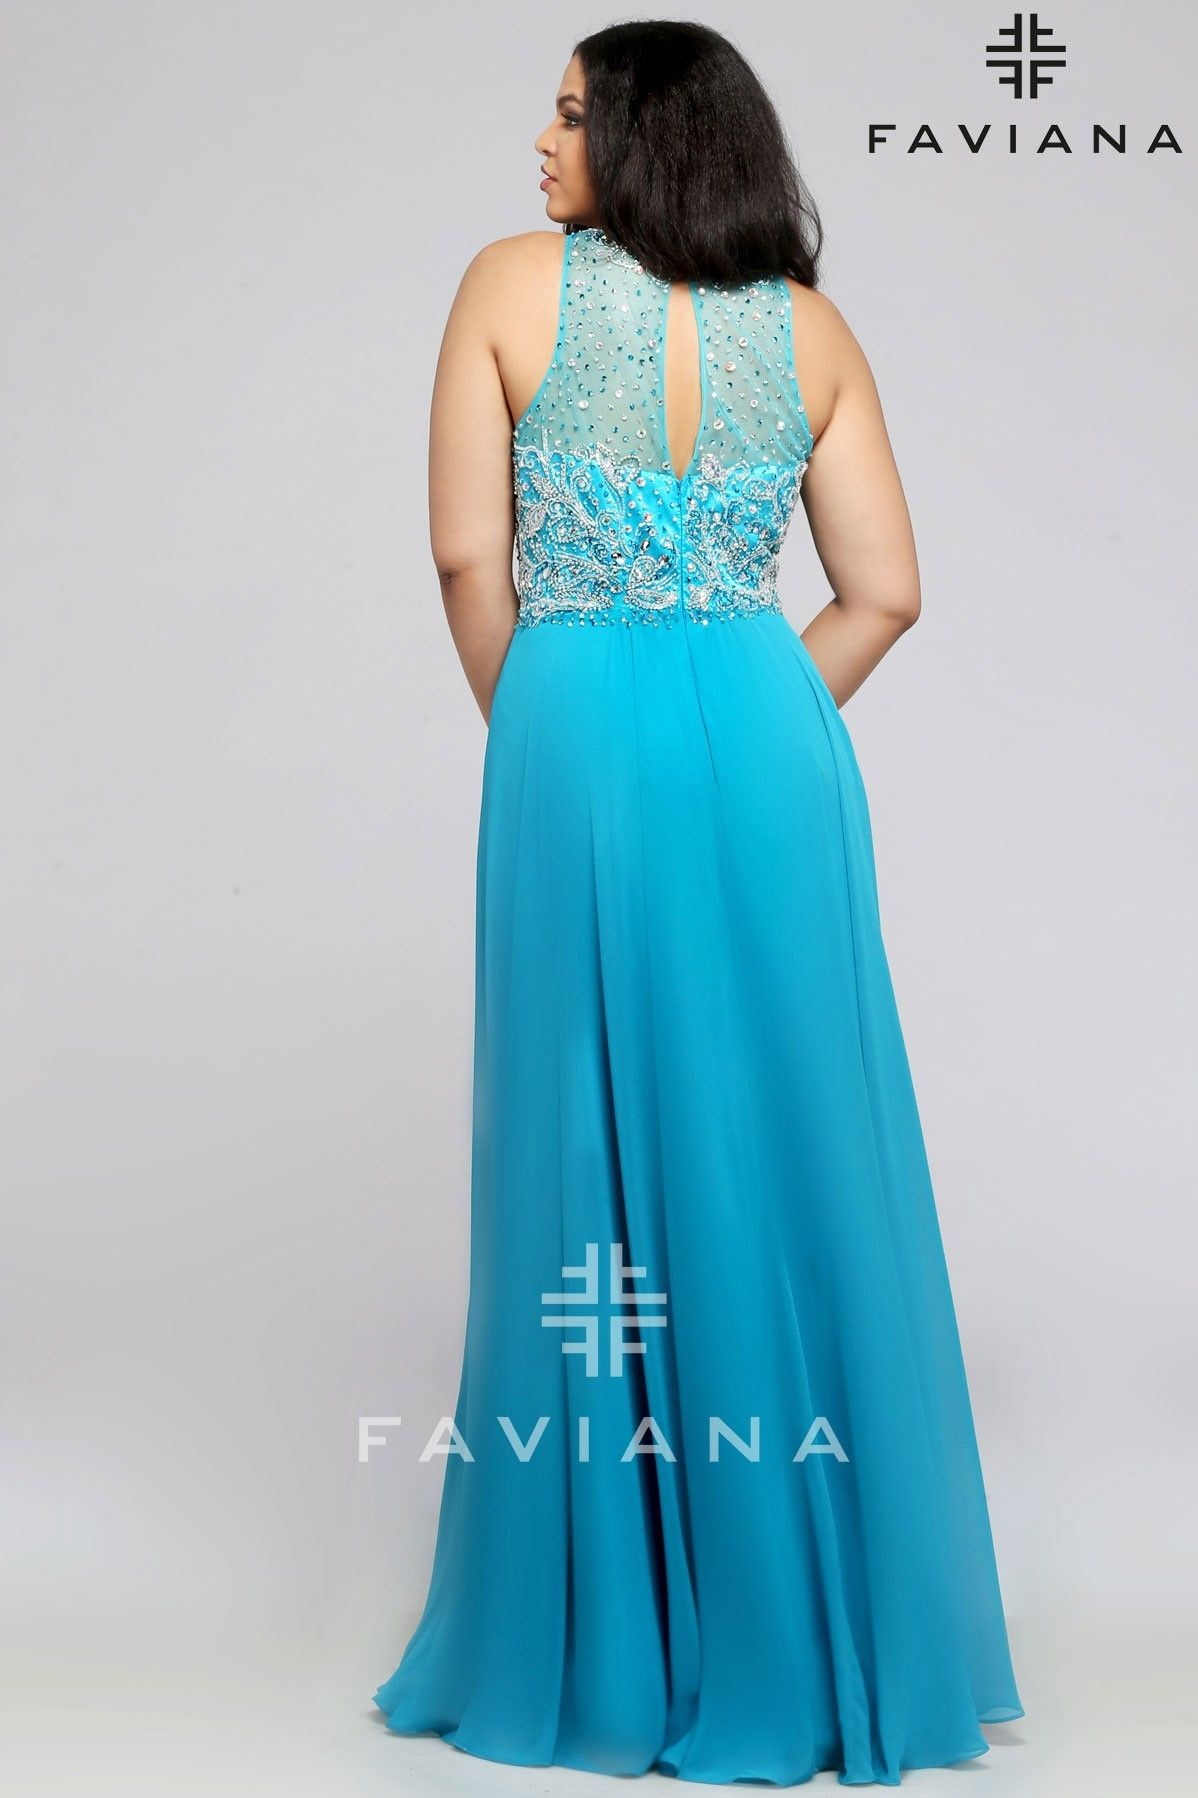 Faviana chiffon with beaded bust and keyhole back bridesmaid